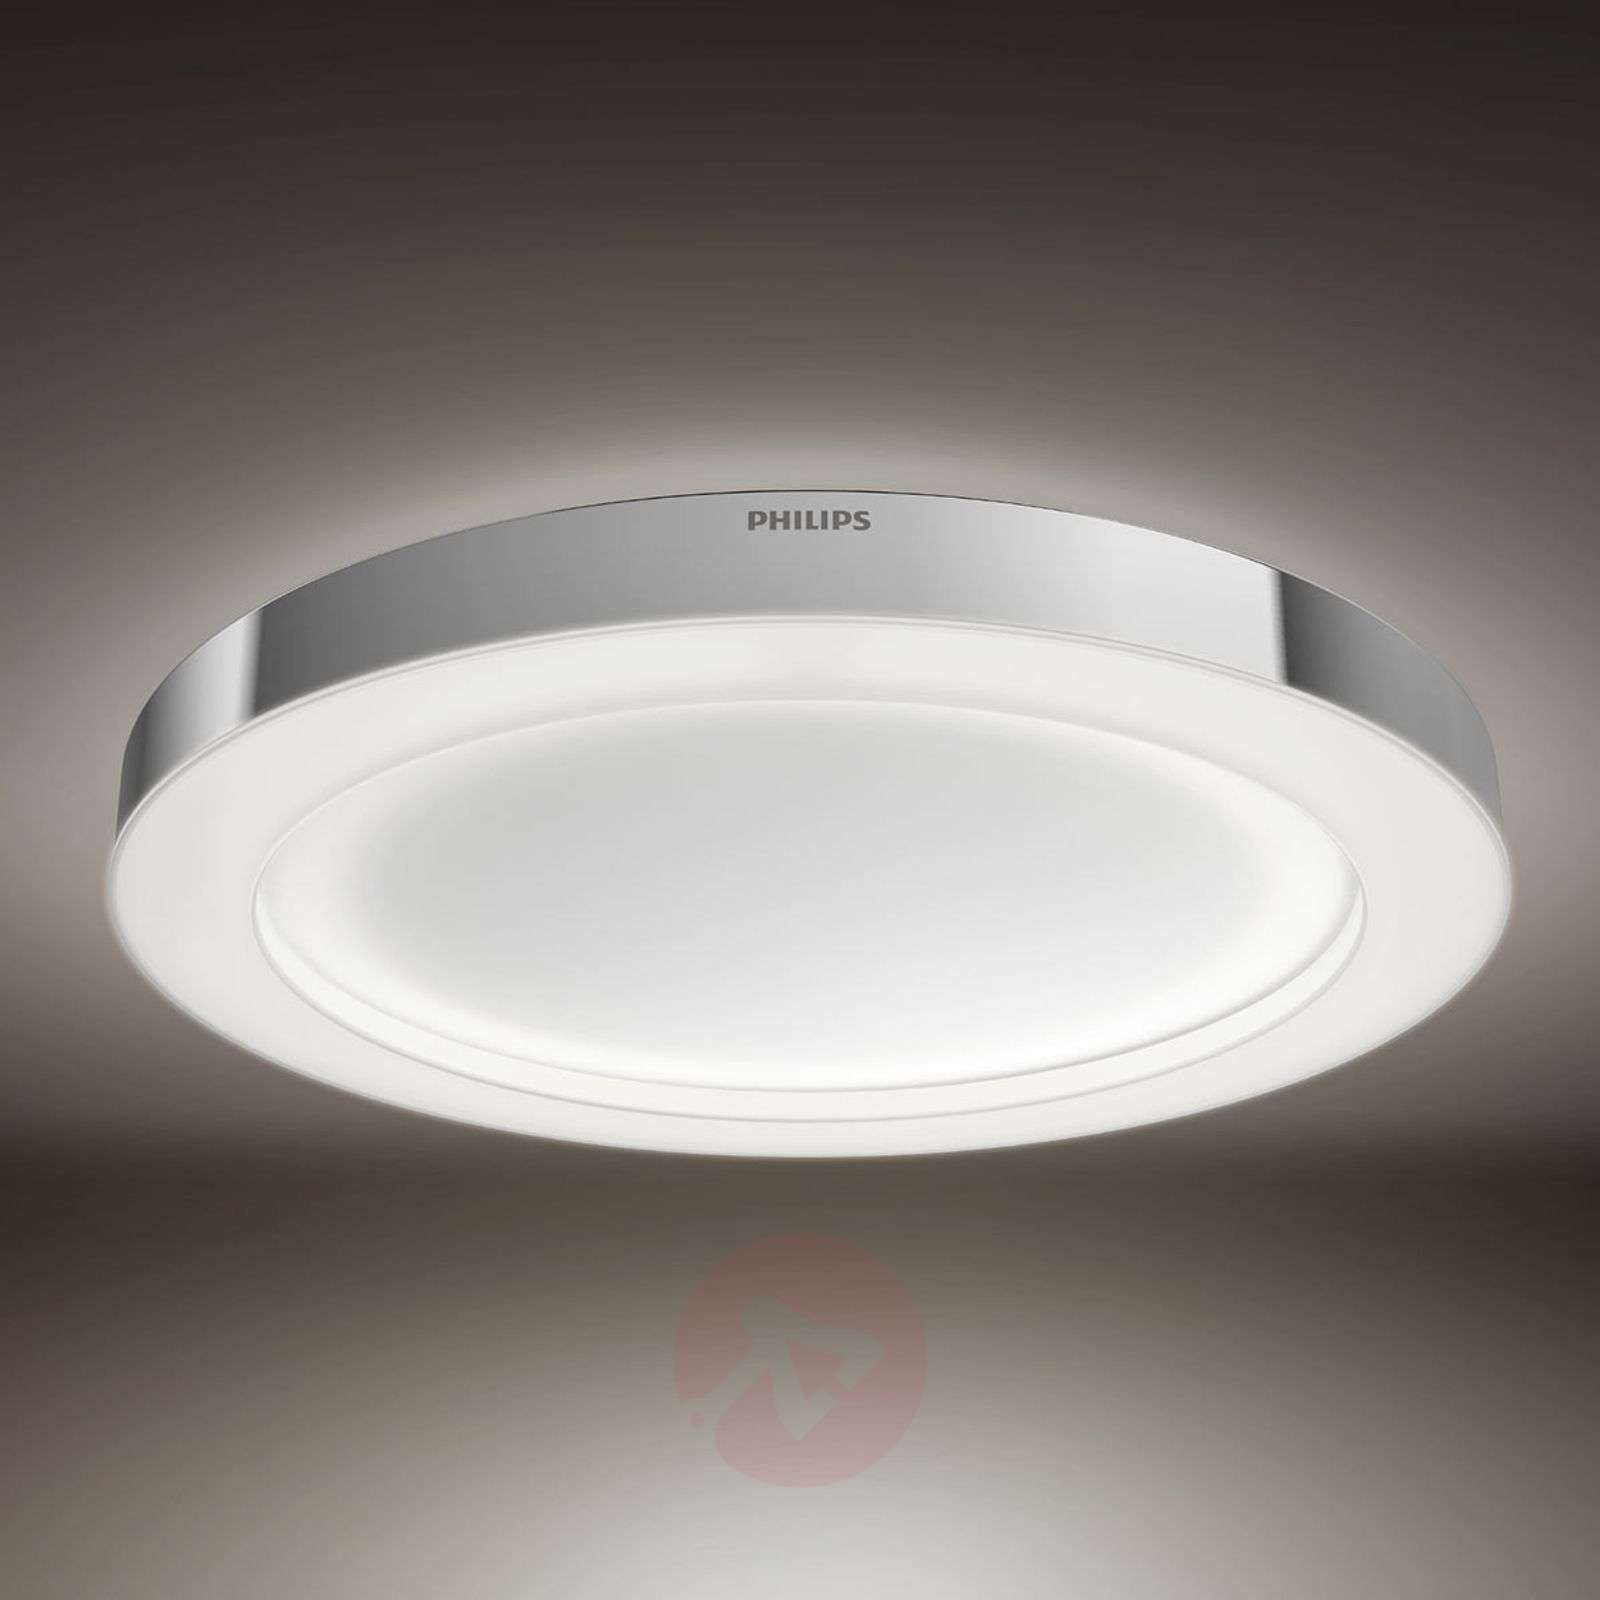 Philips Hue Adore Bathroom Ceiling Lamp Lights Ie